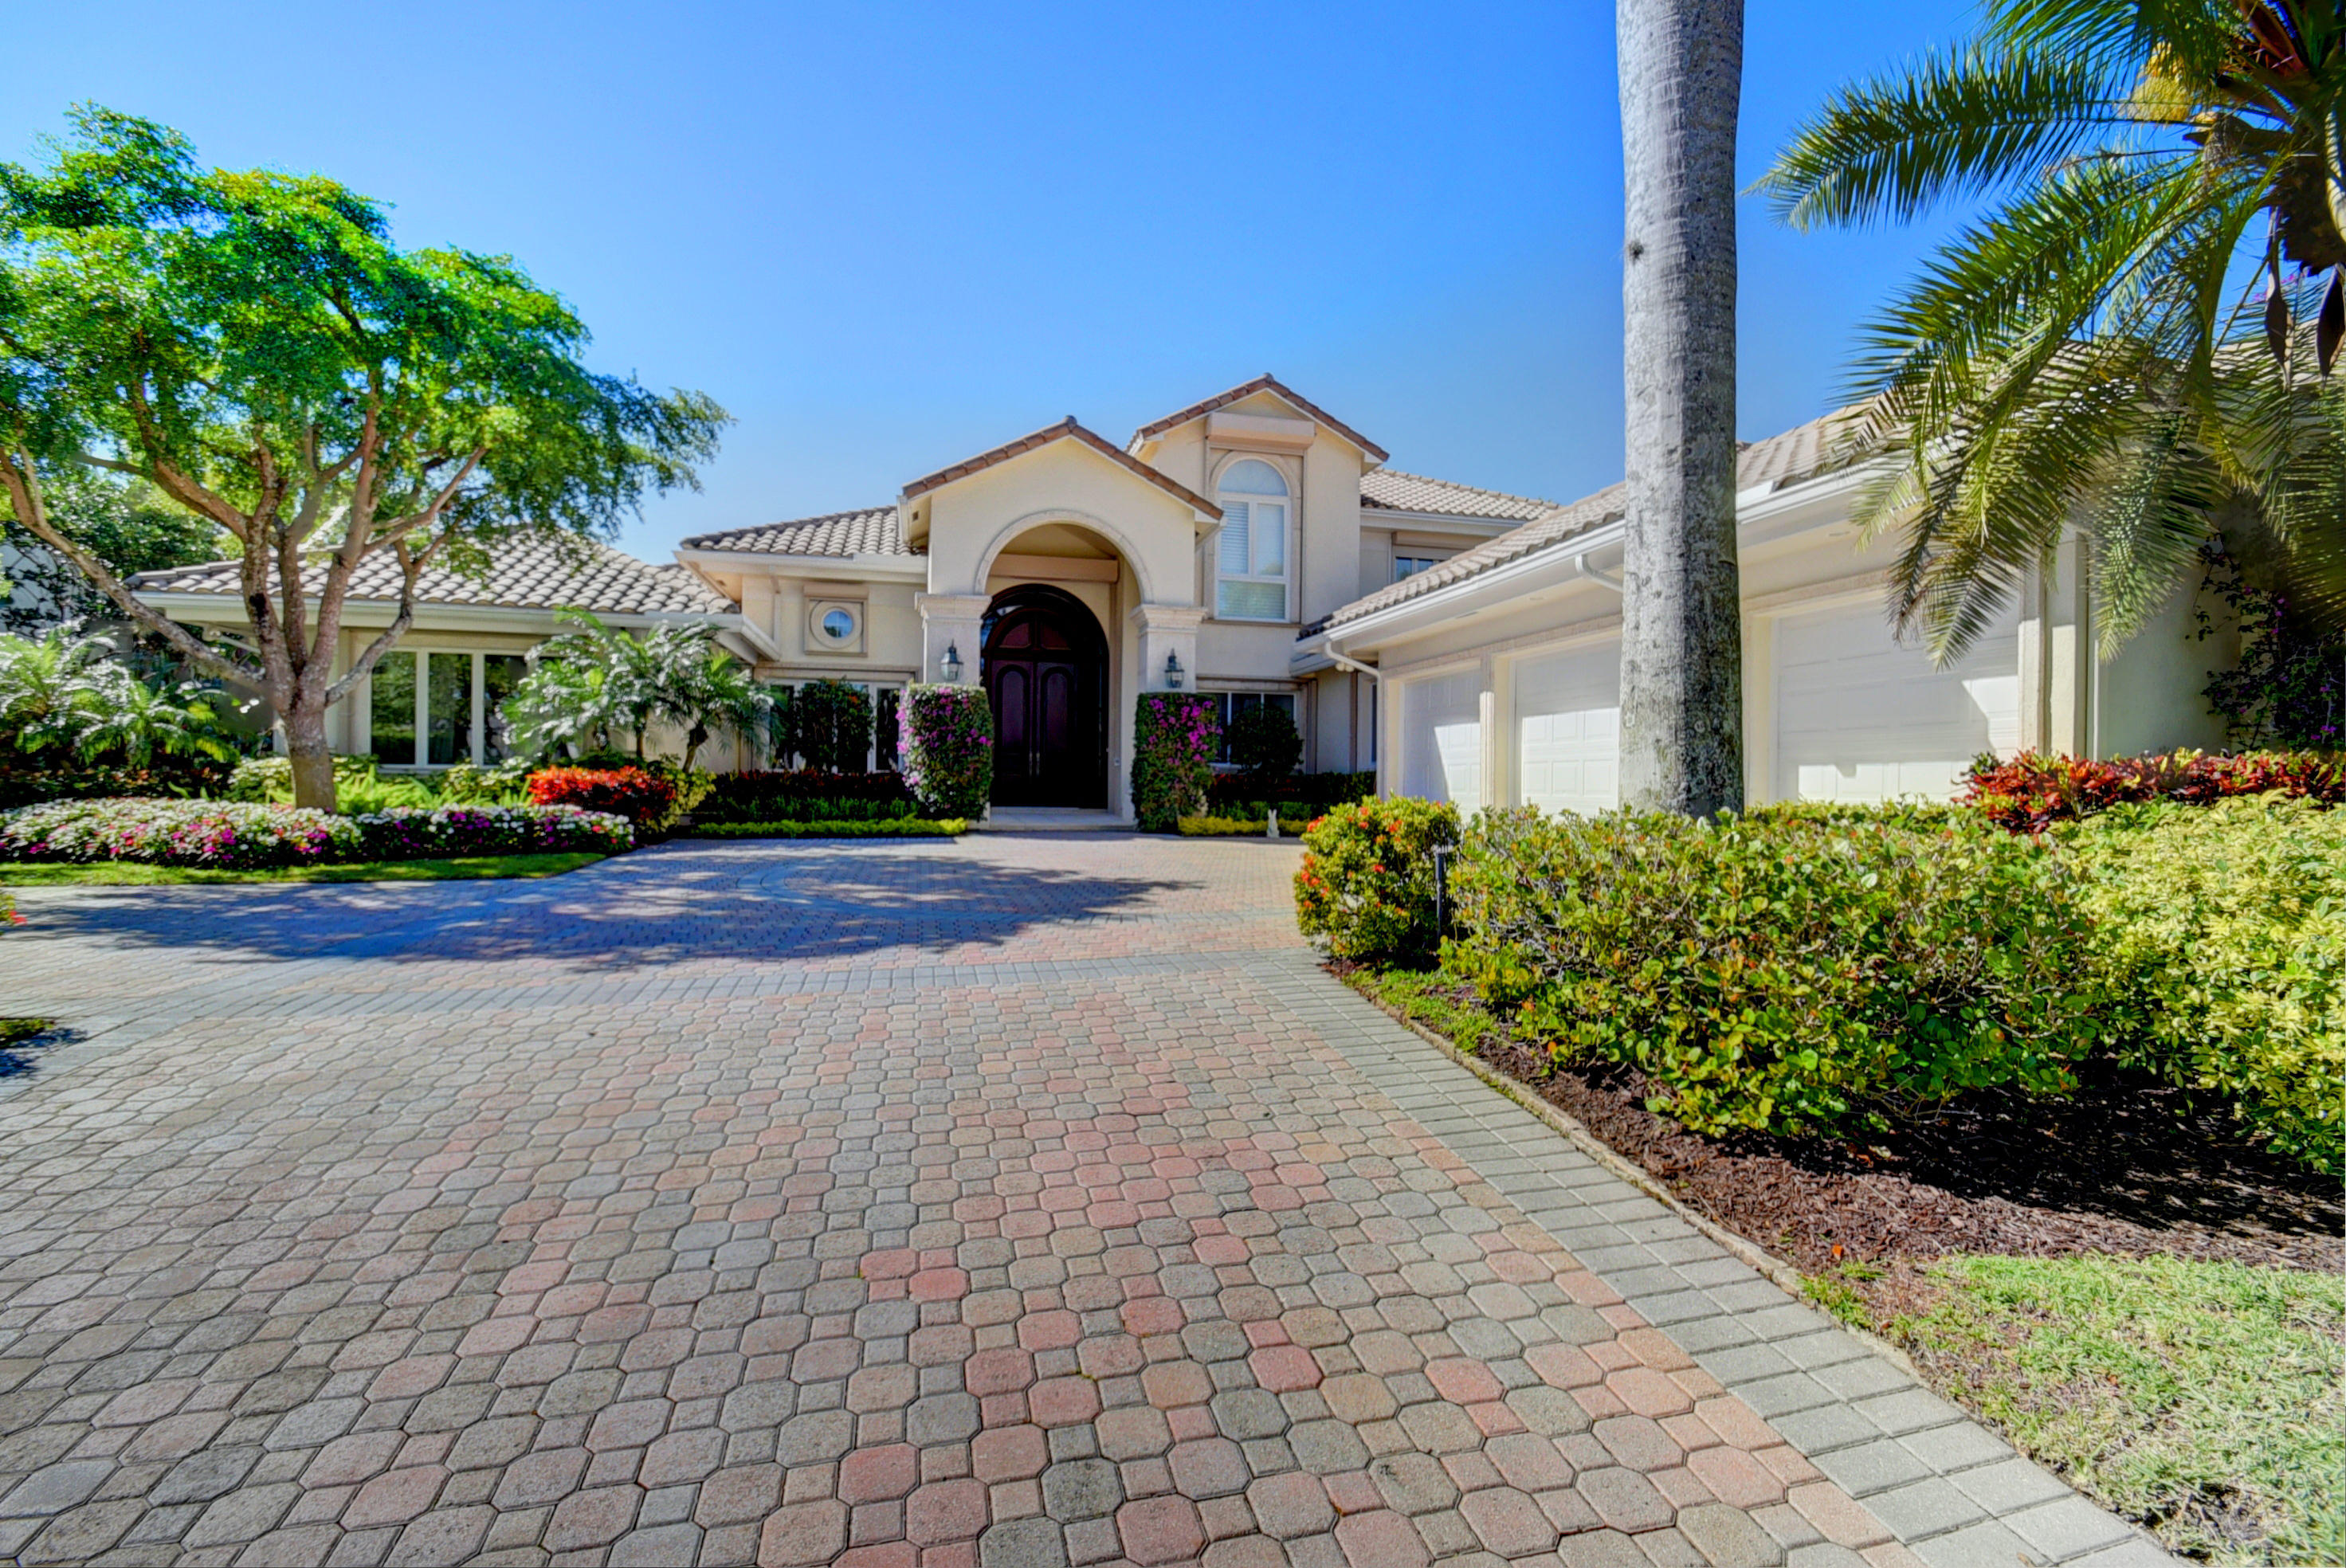 Photo of 6367 NW 26th Terrace, Boca Raton, FL 33496